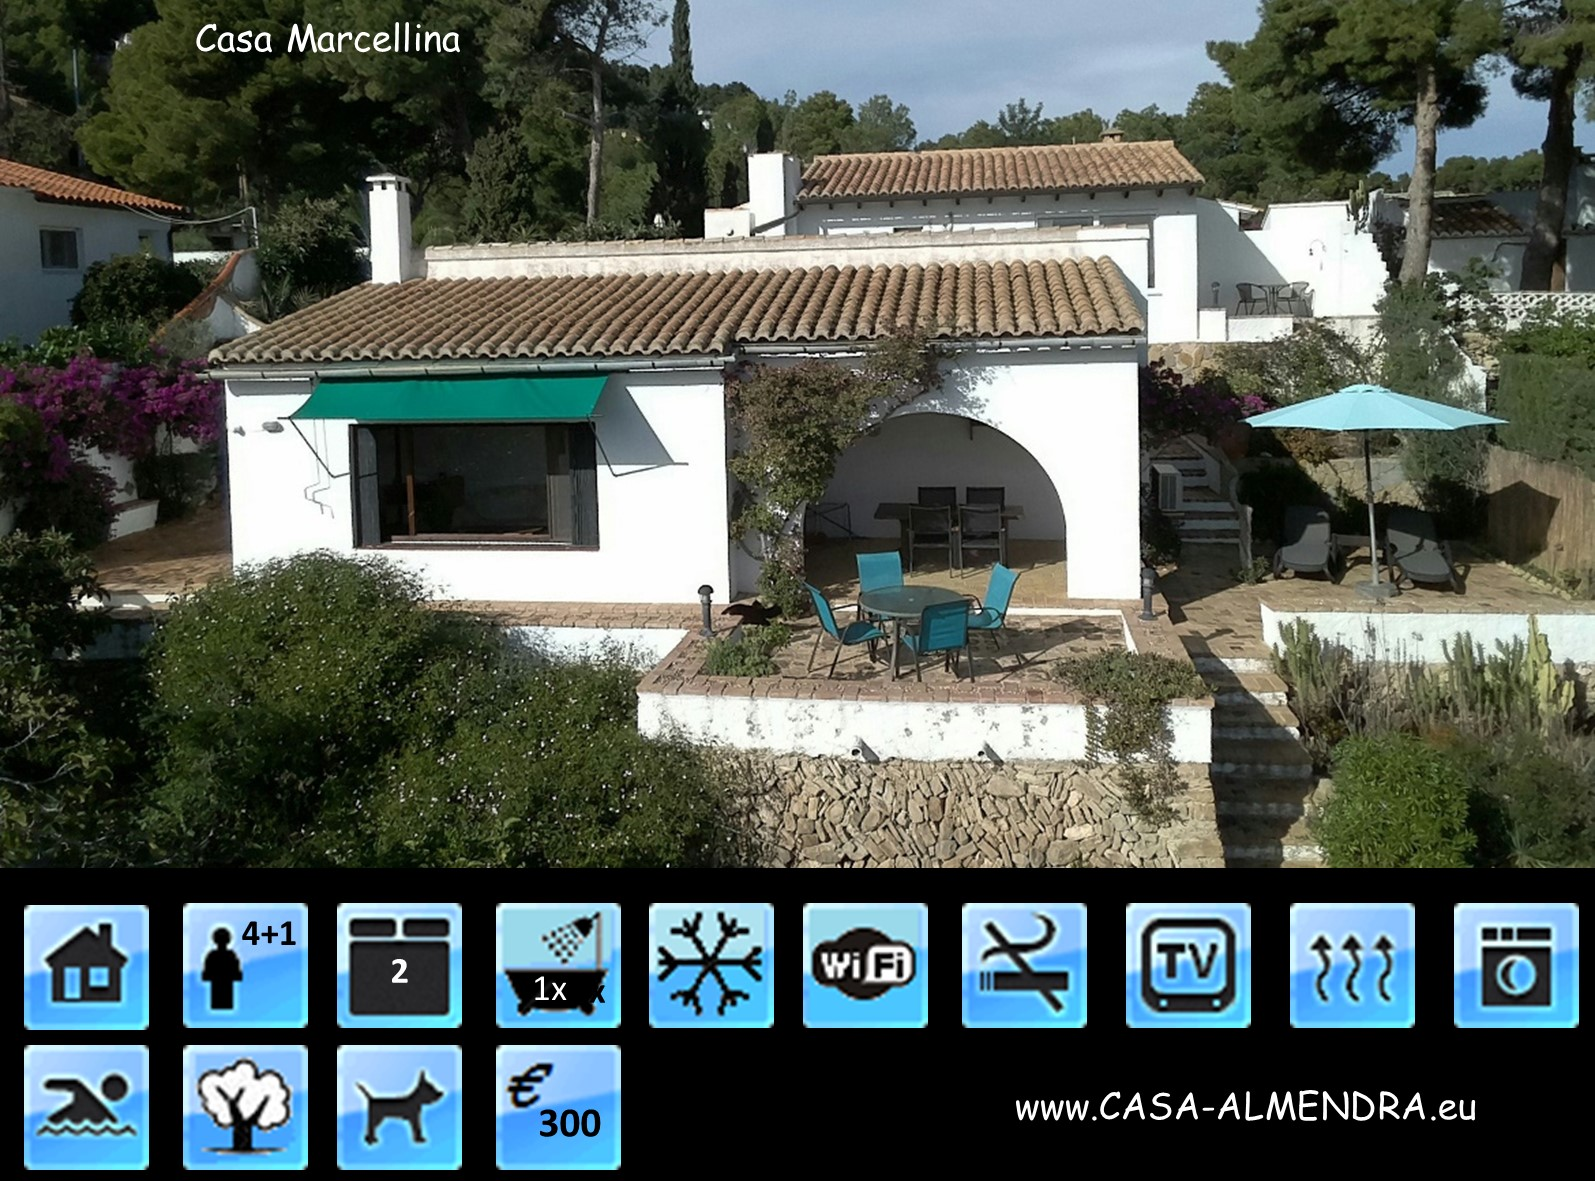 Vakantiehuis Casa Marcellina @ Casa Almendra in Calpe